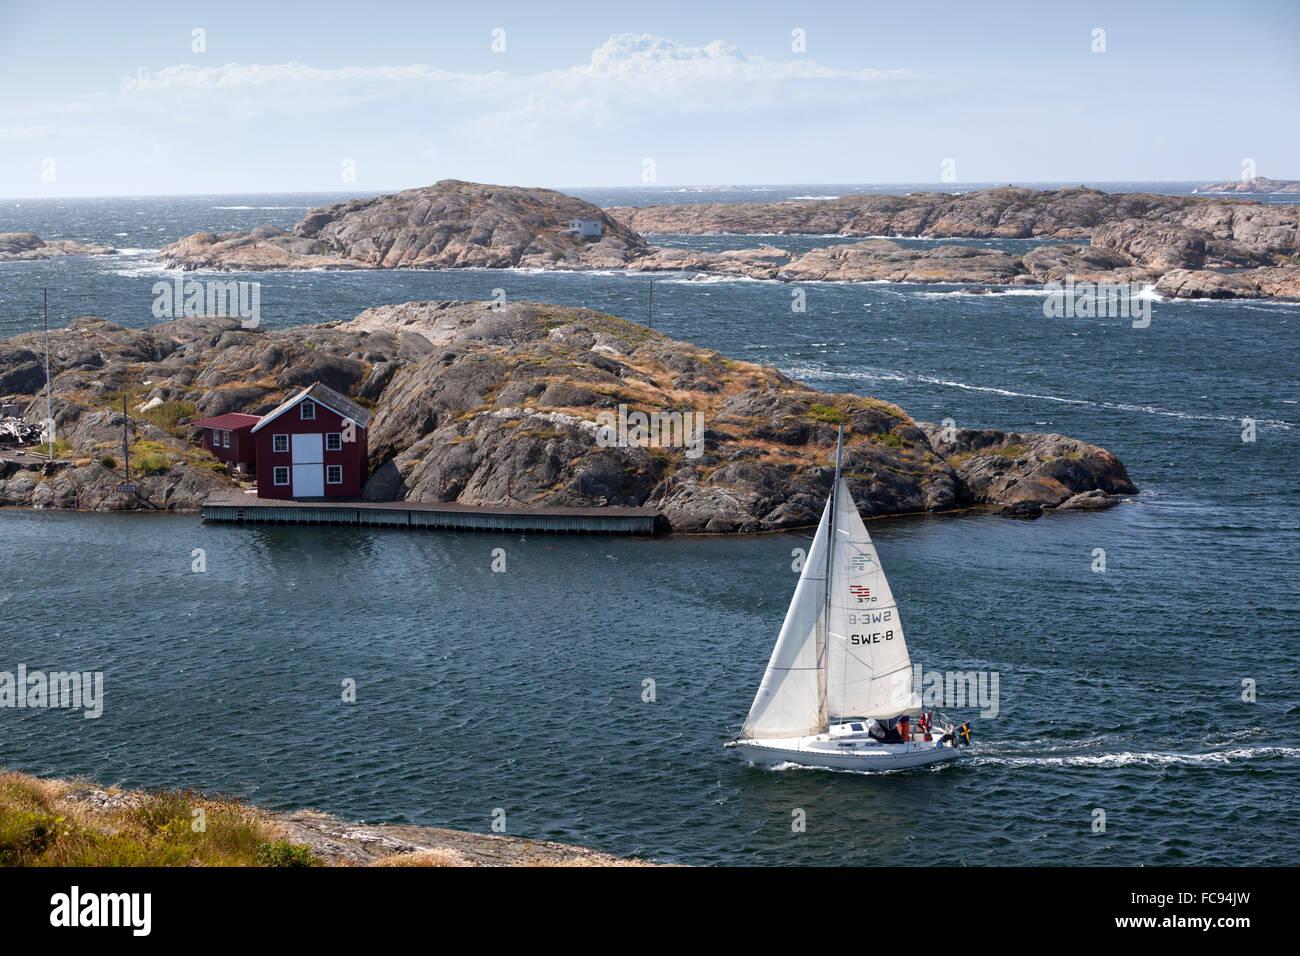 Yacht sailing through islands of archipelago, Skarhamn, Tjorn, Bohuslan Coast, southwest Sweden, Sweden, Scandinavia, - Stock Image